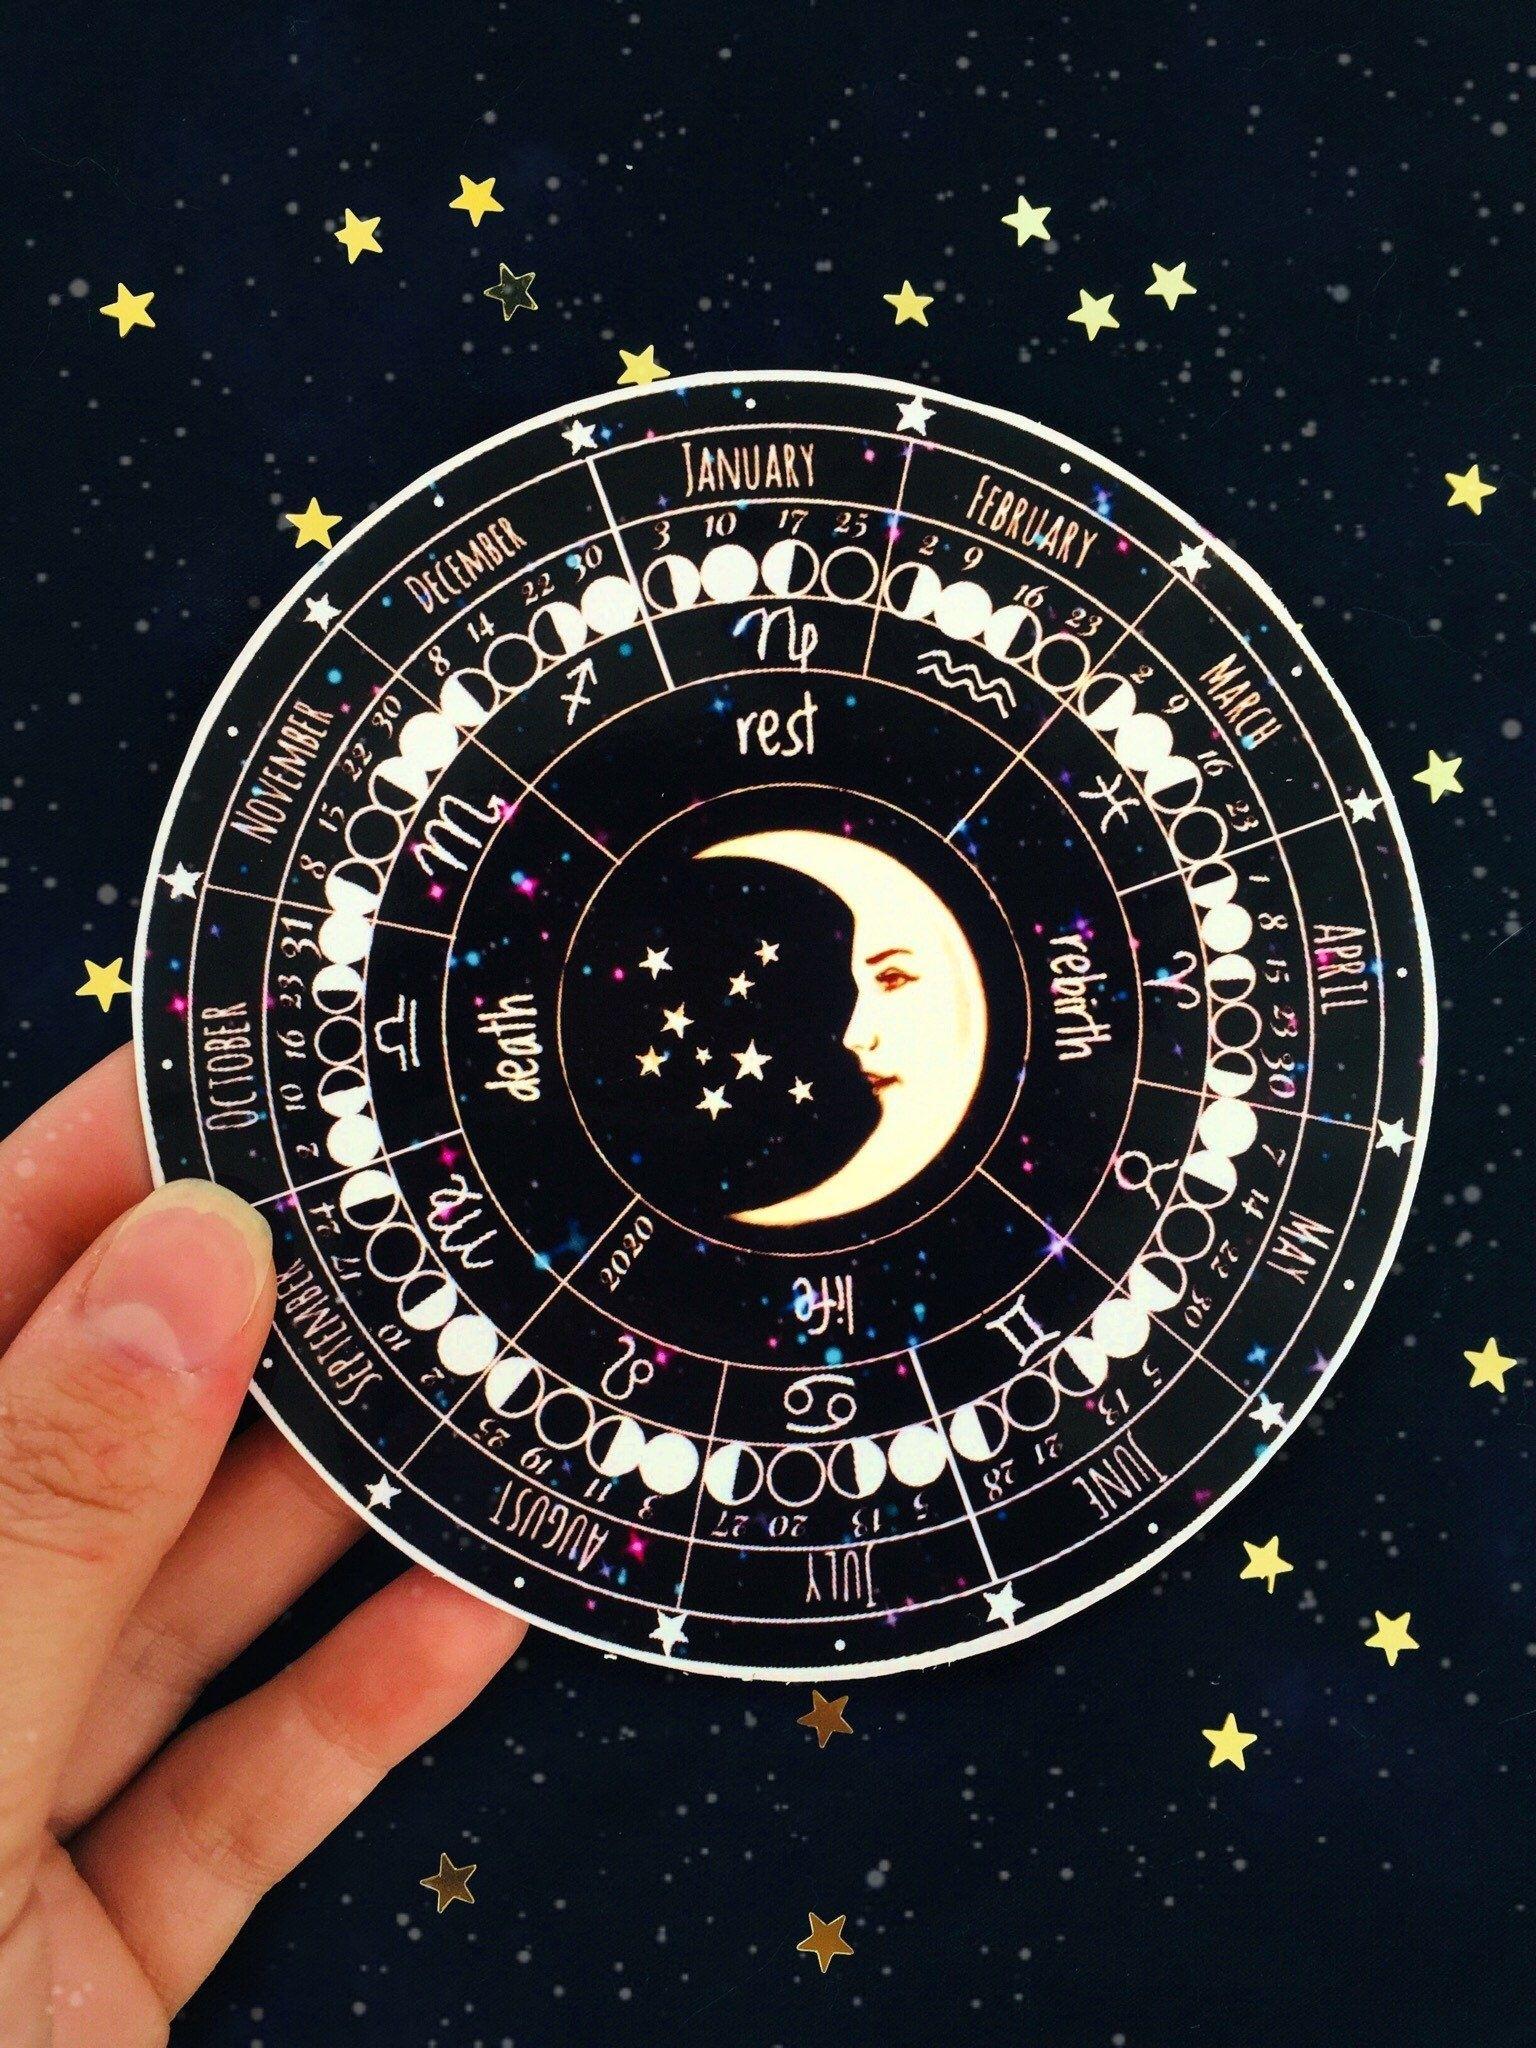 Moon Calendar 2021 Lunar Calendar Zodiac Calendar | Etsy